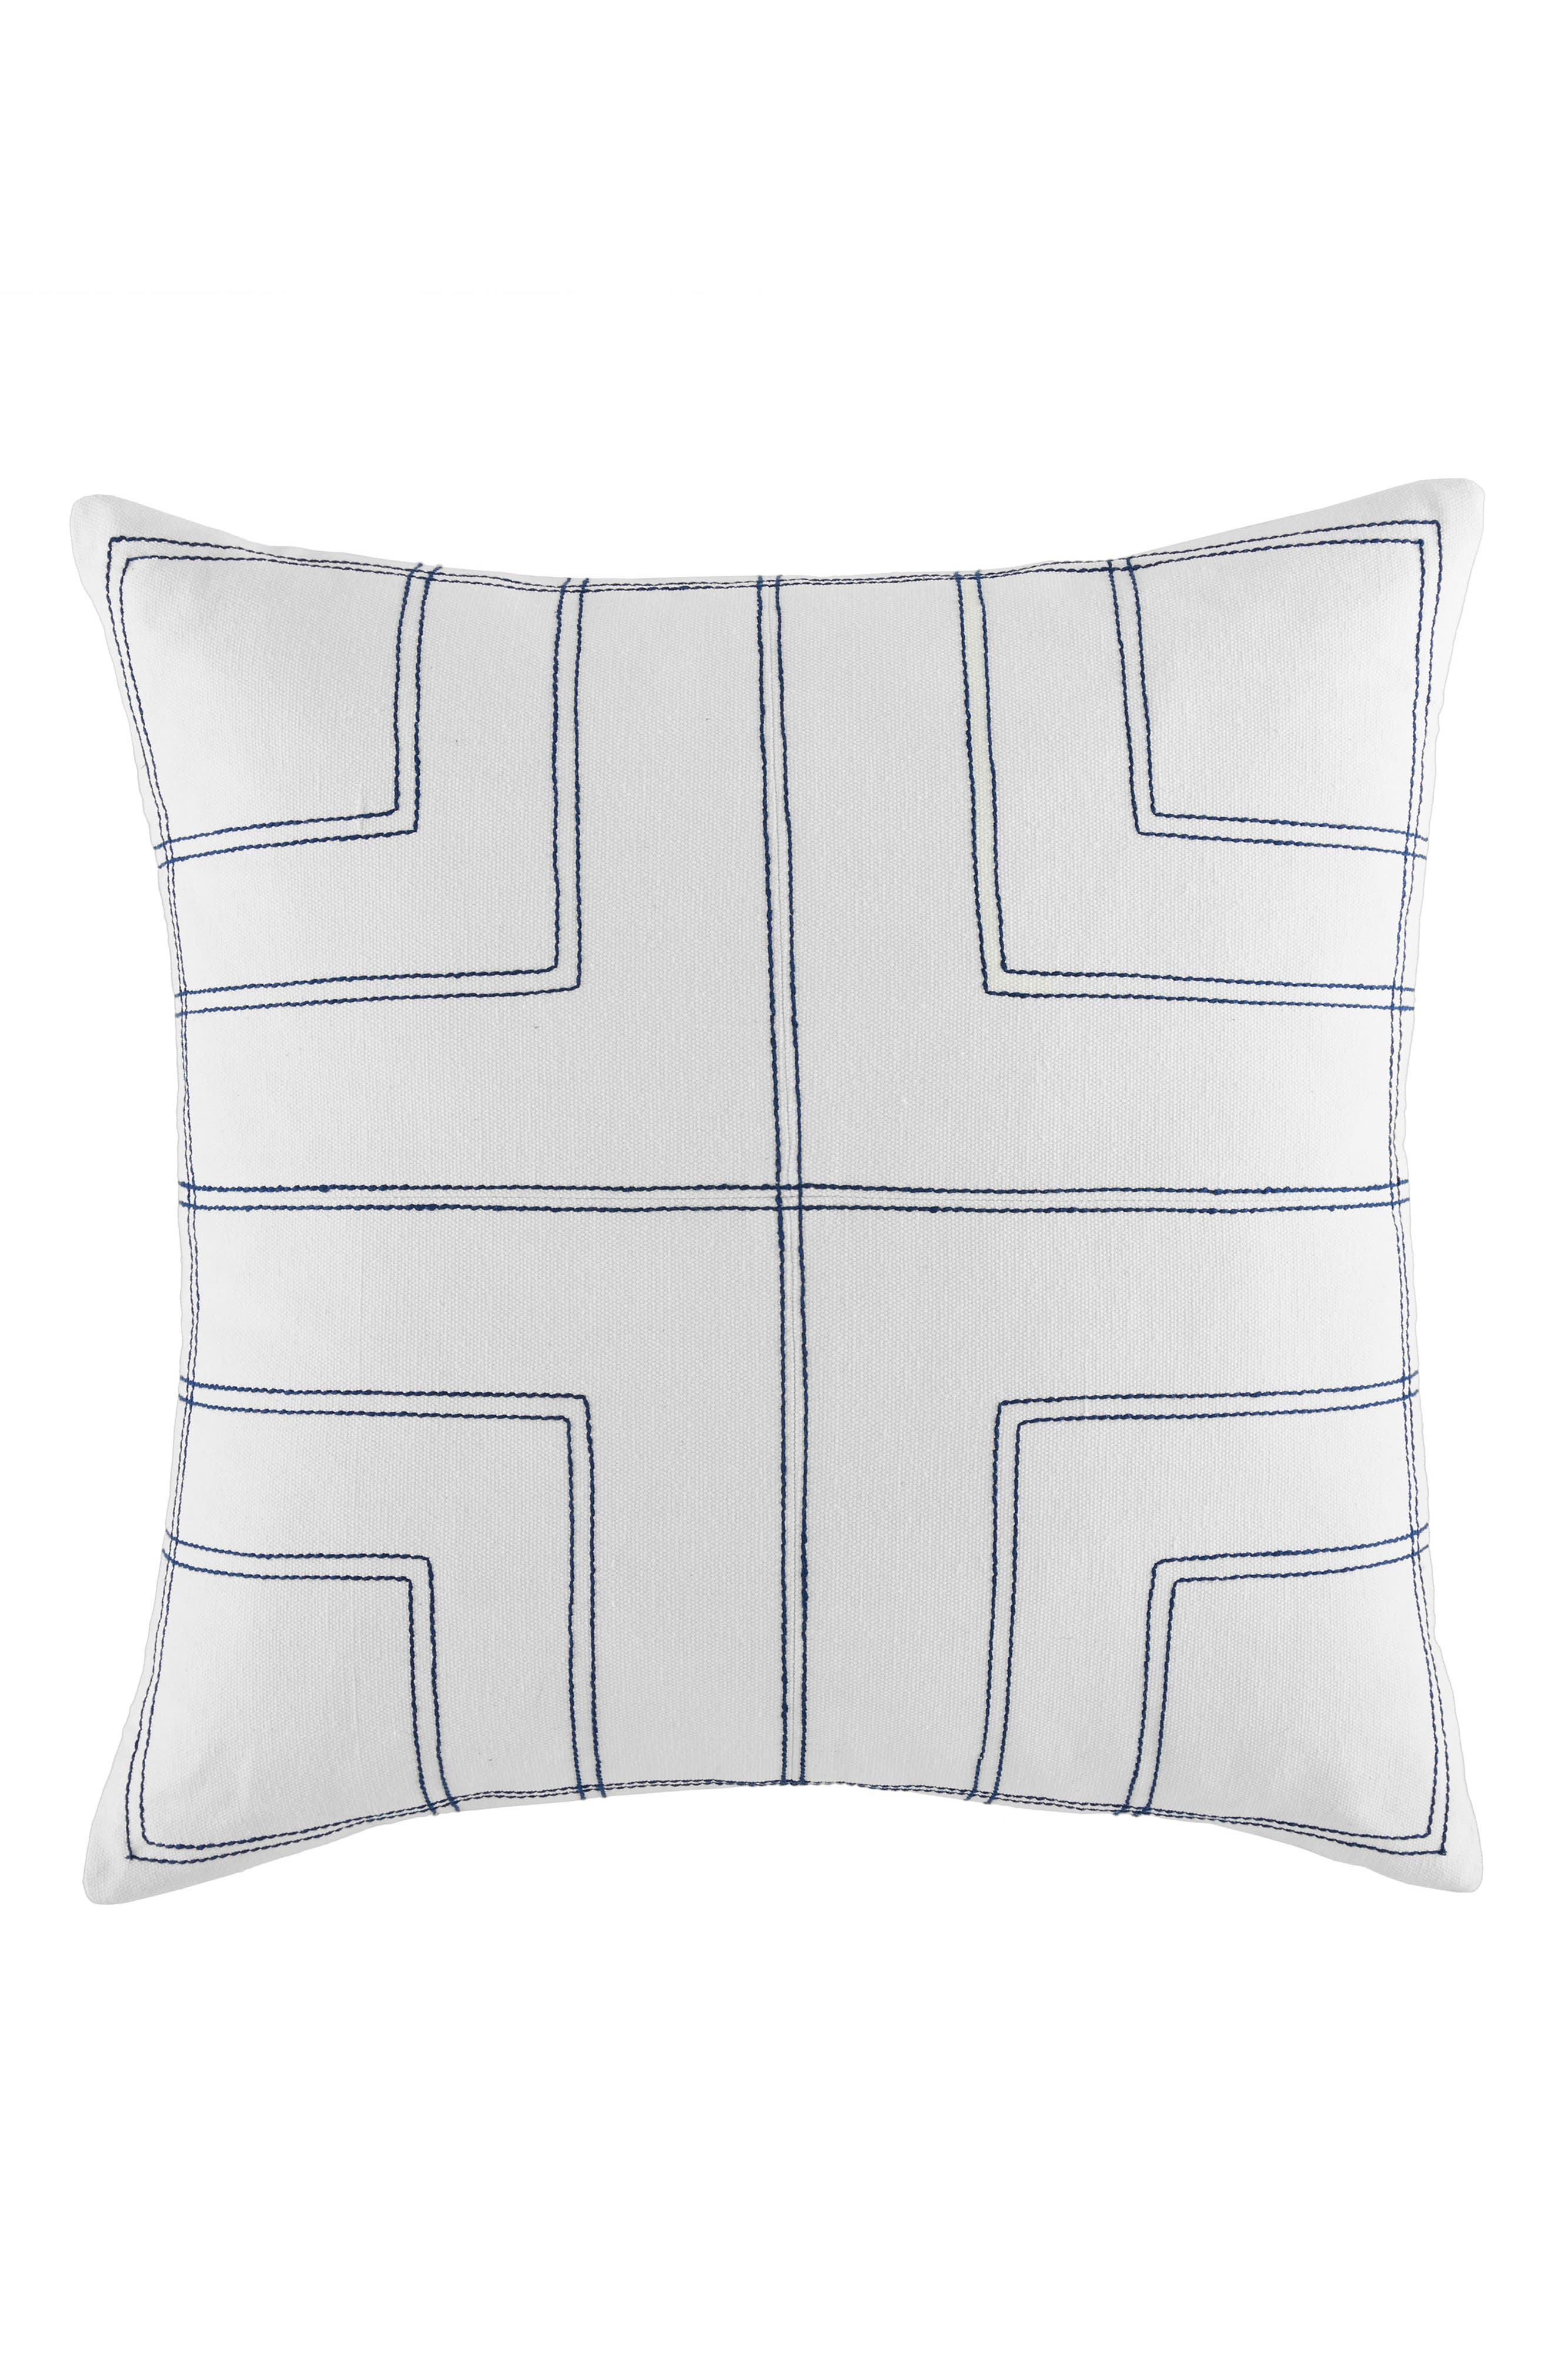 Quadrant Accent Pillow,                         Main,                         color, 100